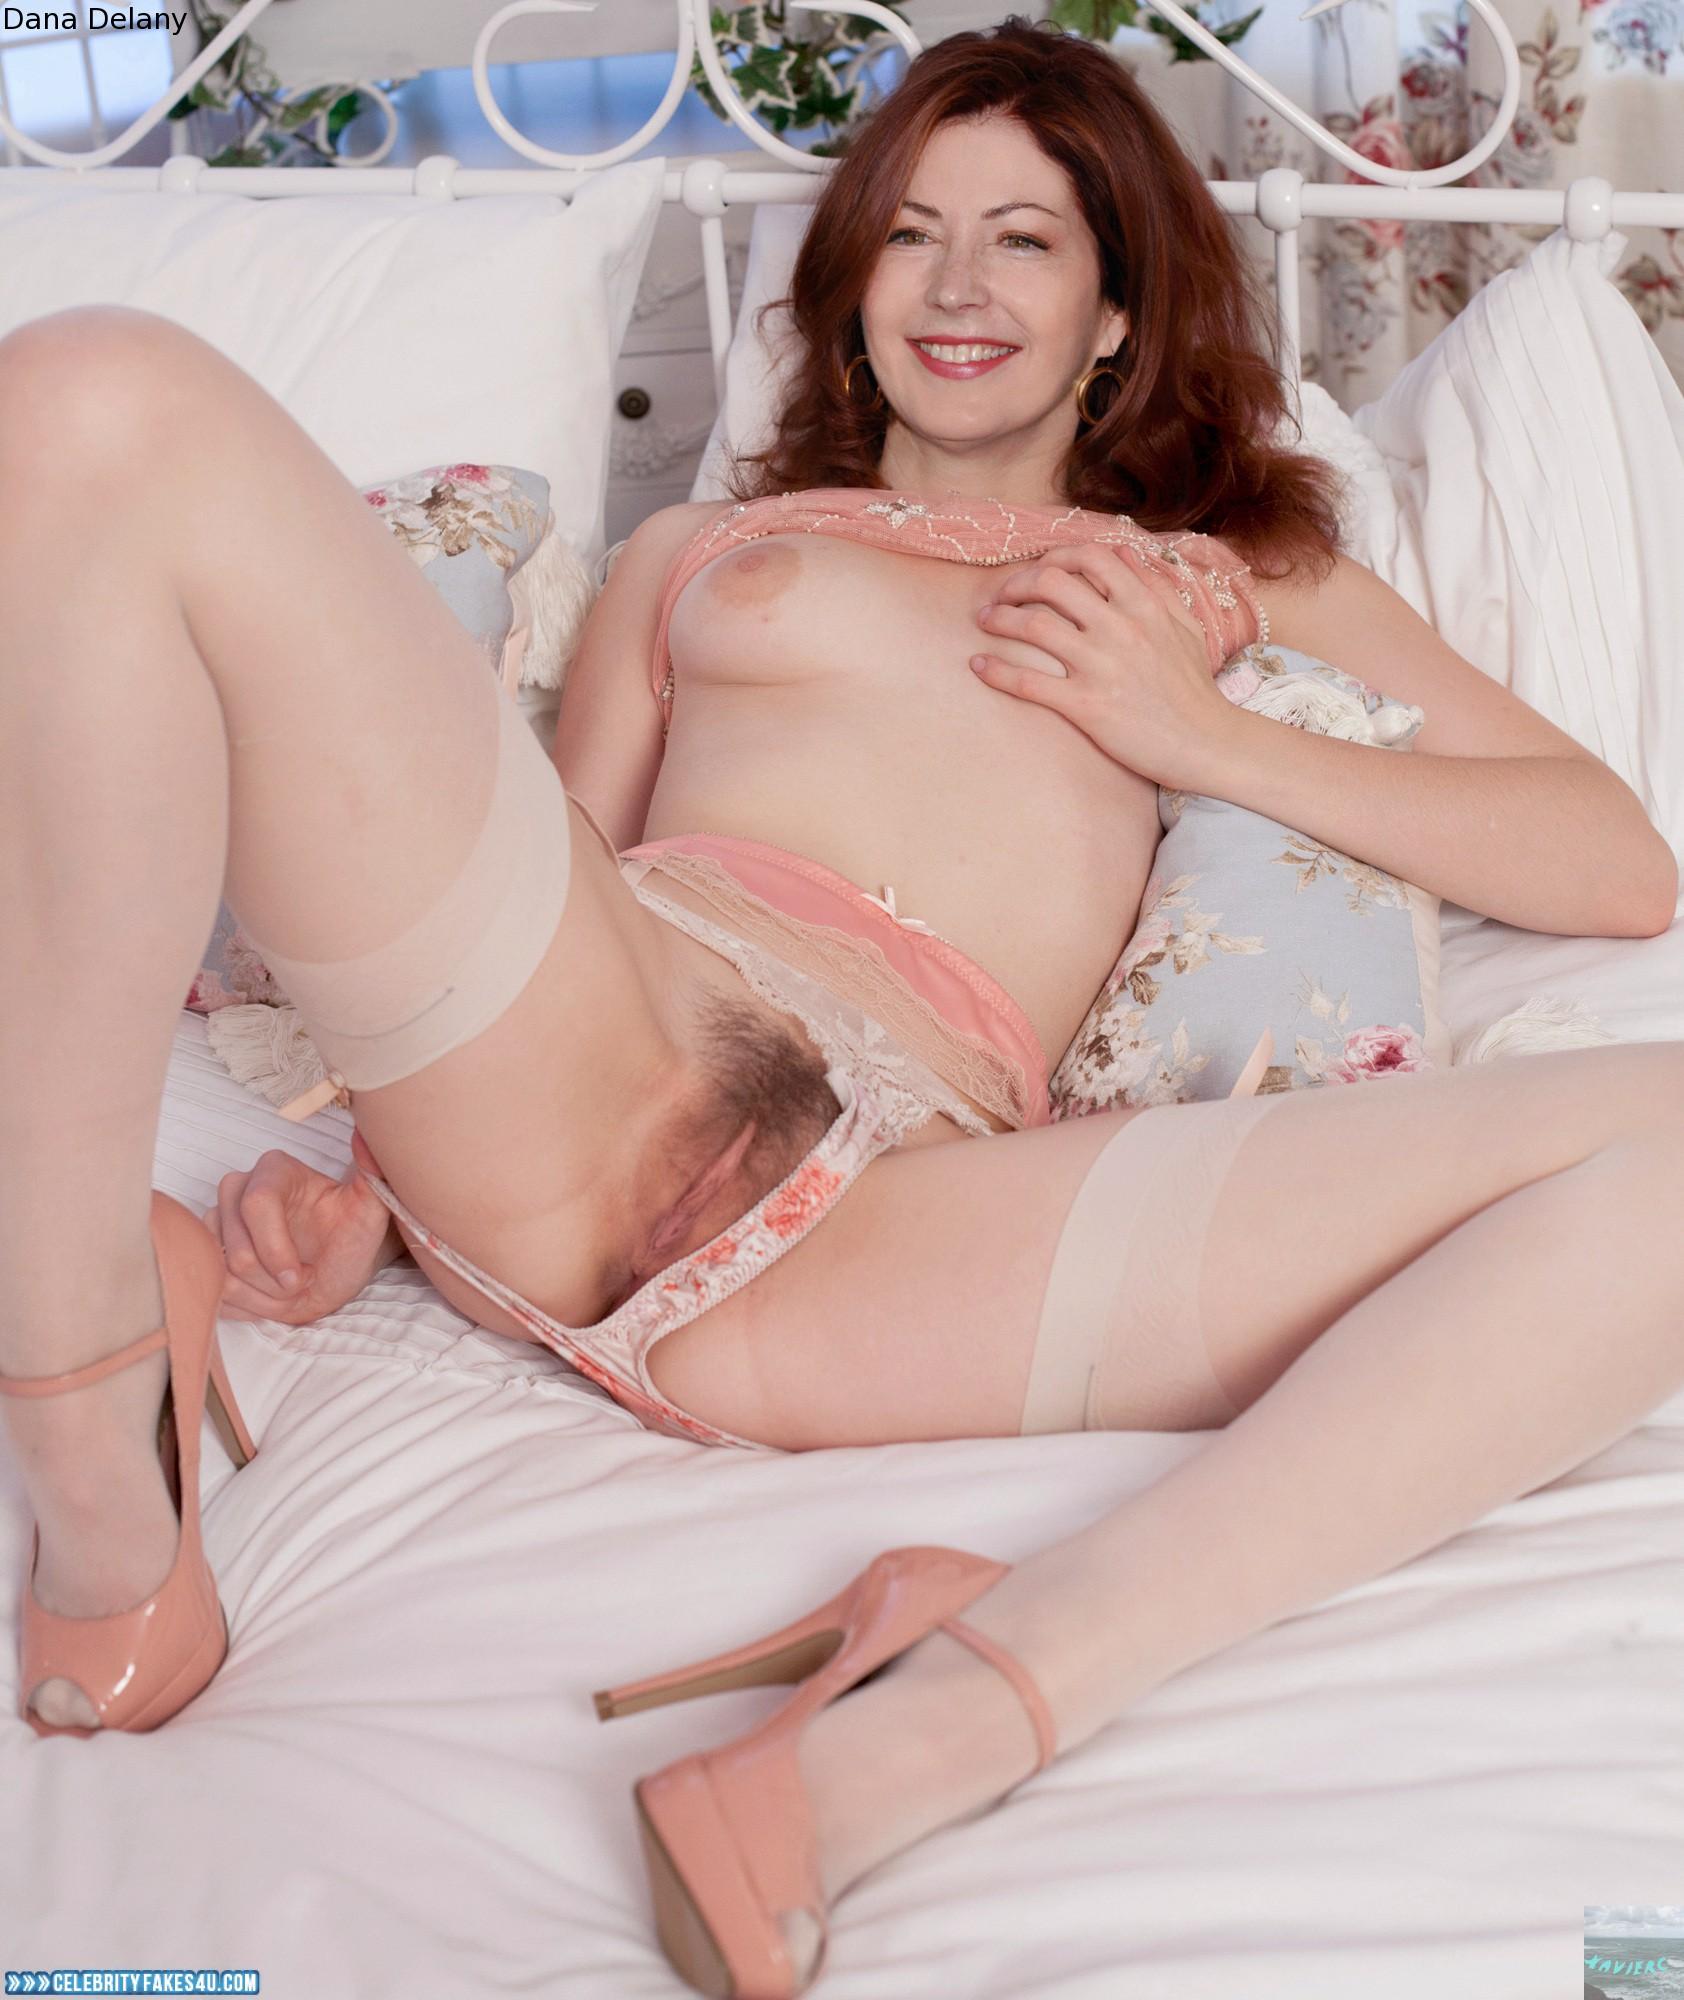 Kim delaney fake nudes, popular black pornstar raven sky